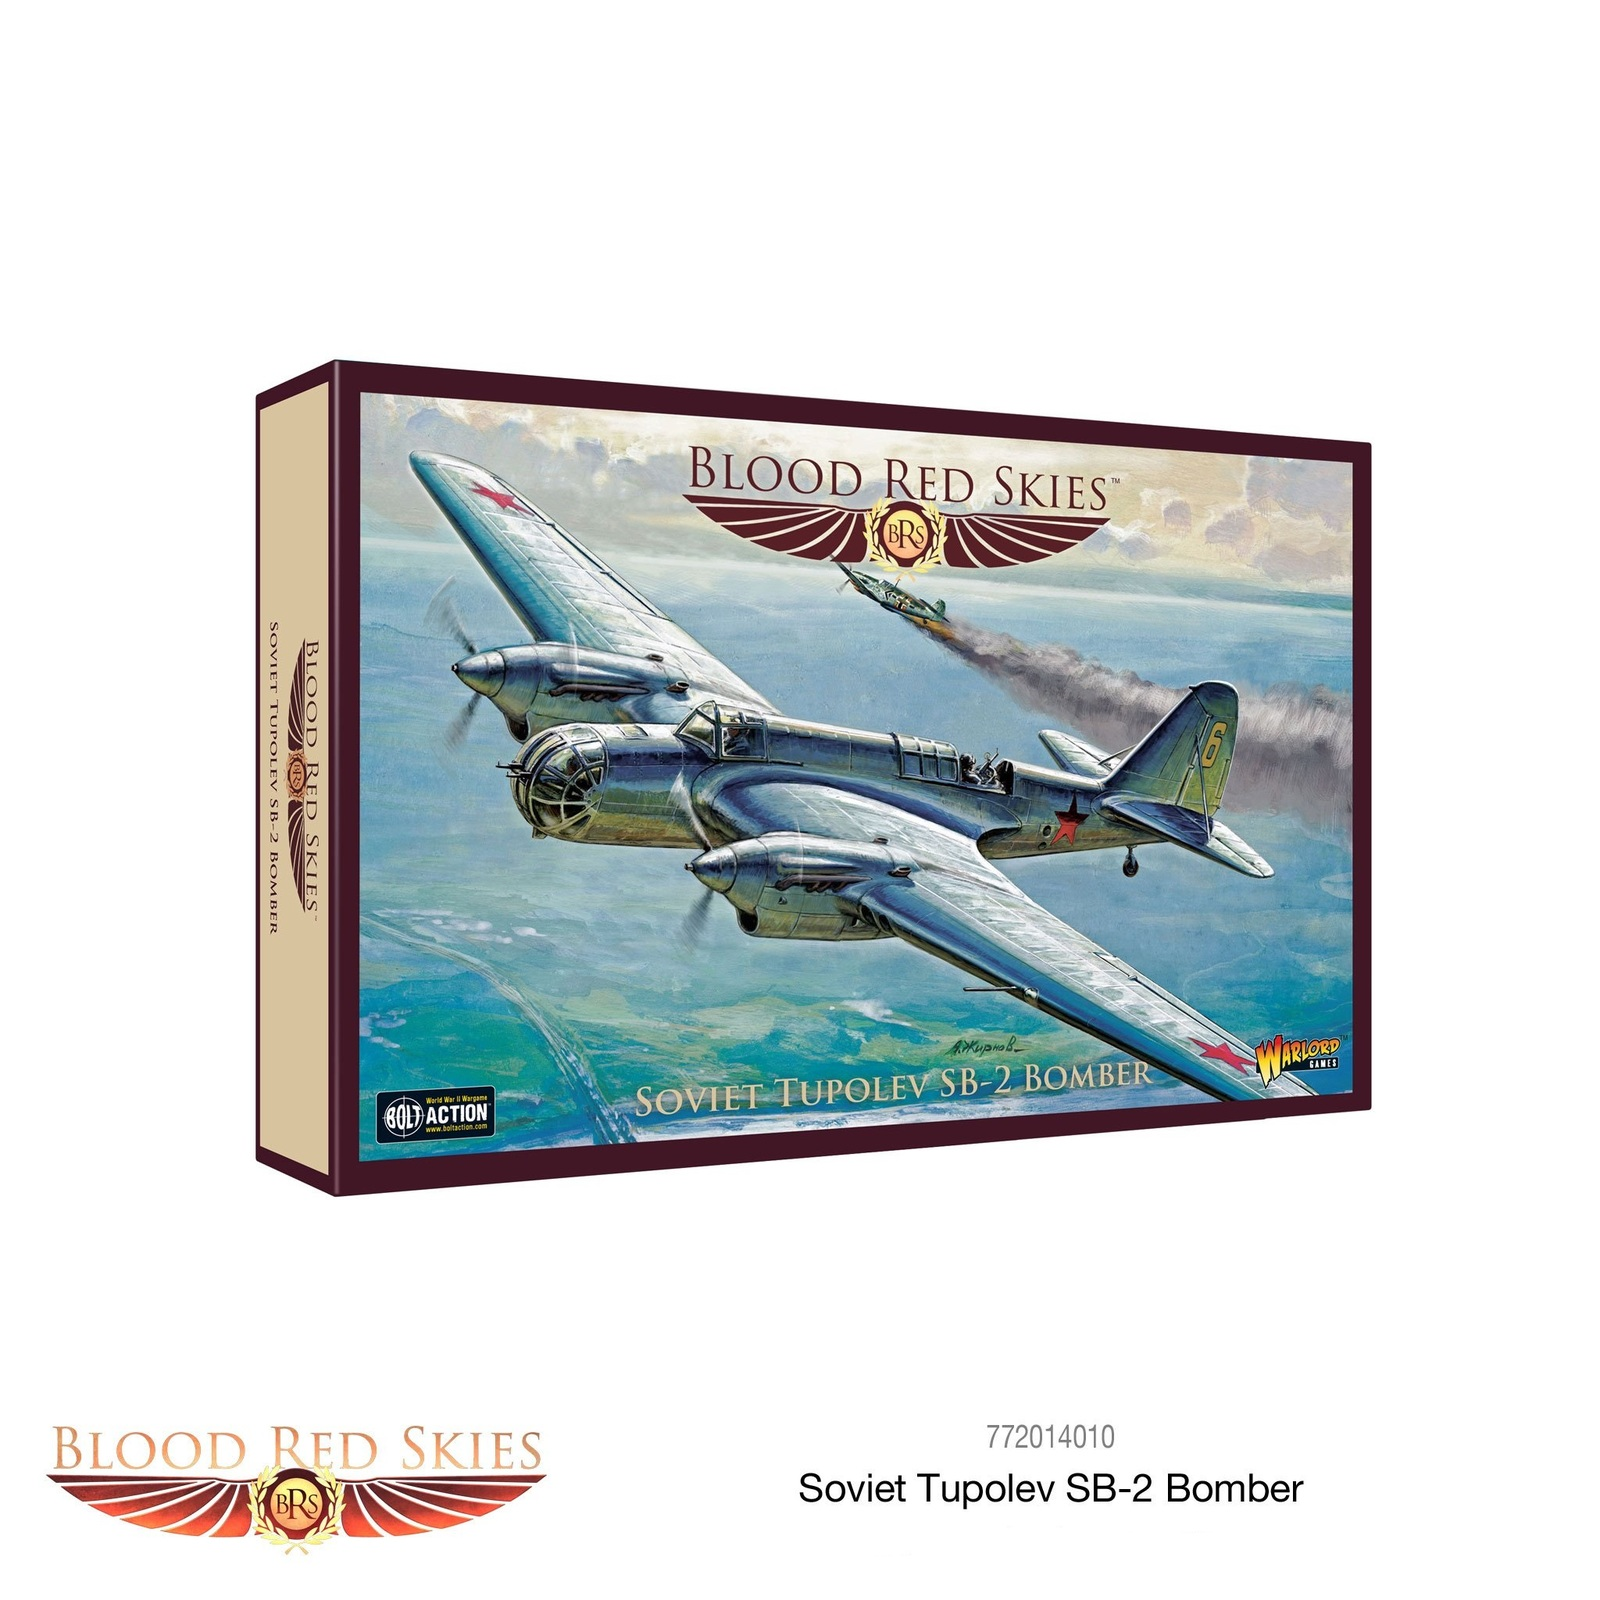 Blood Red Skies: Soviet Tupolev ANT-40 (SB-2) Soviet Bomber image